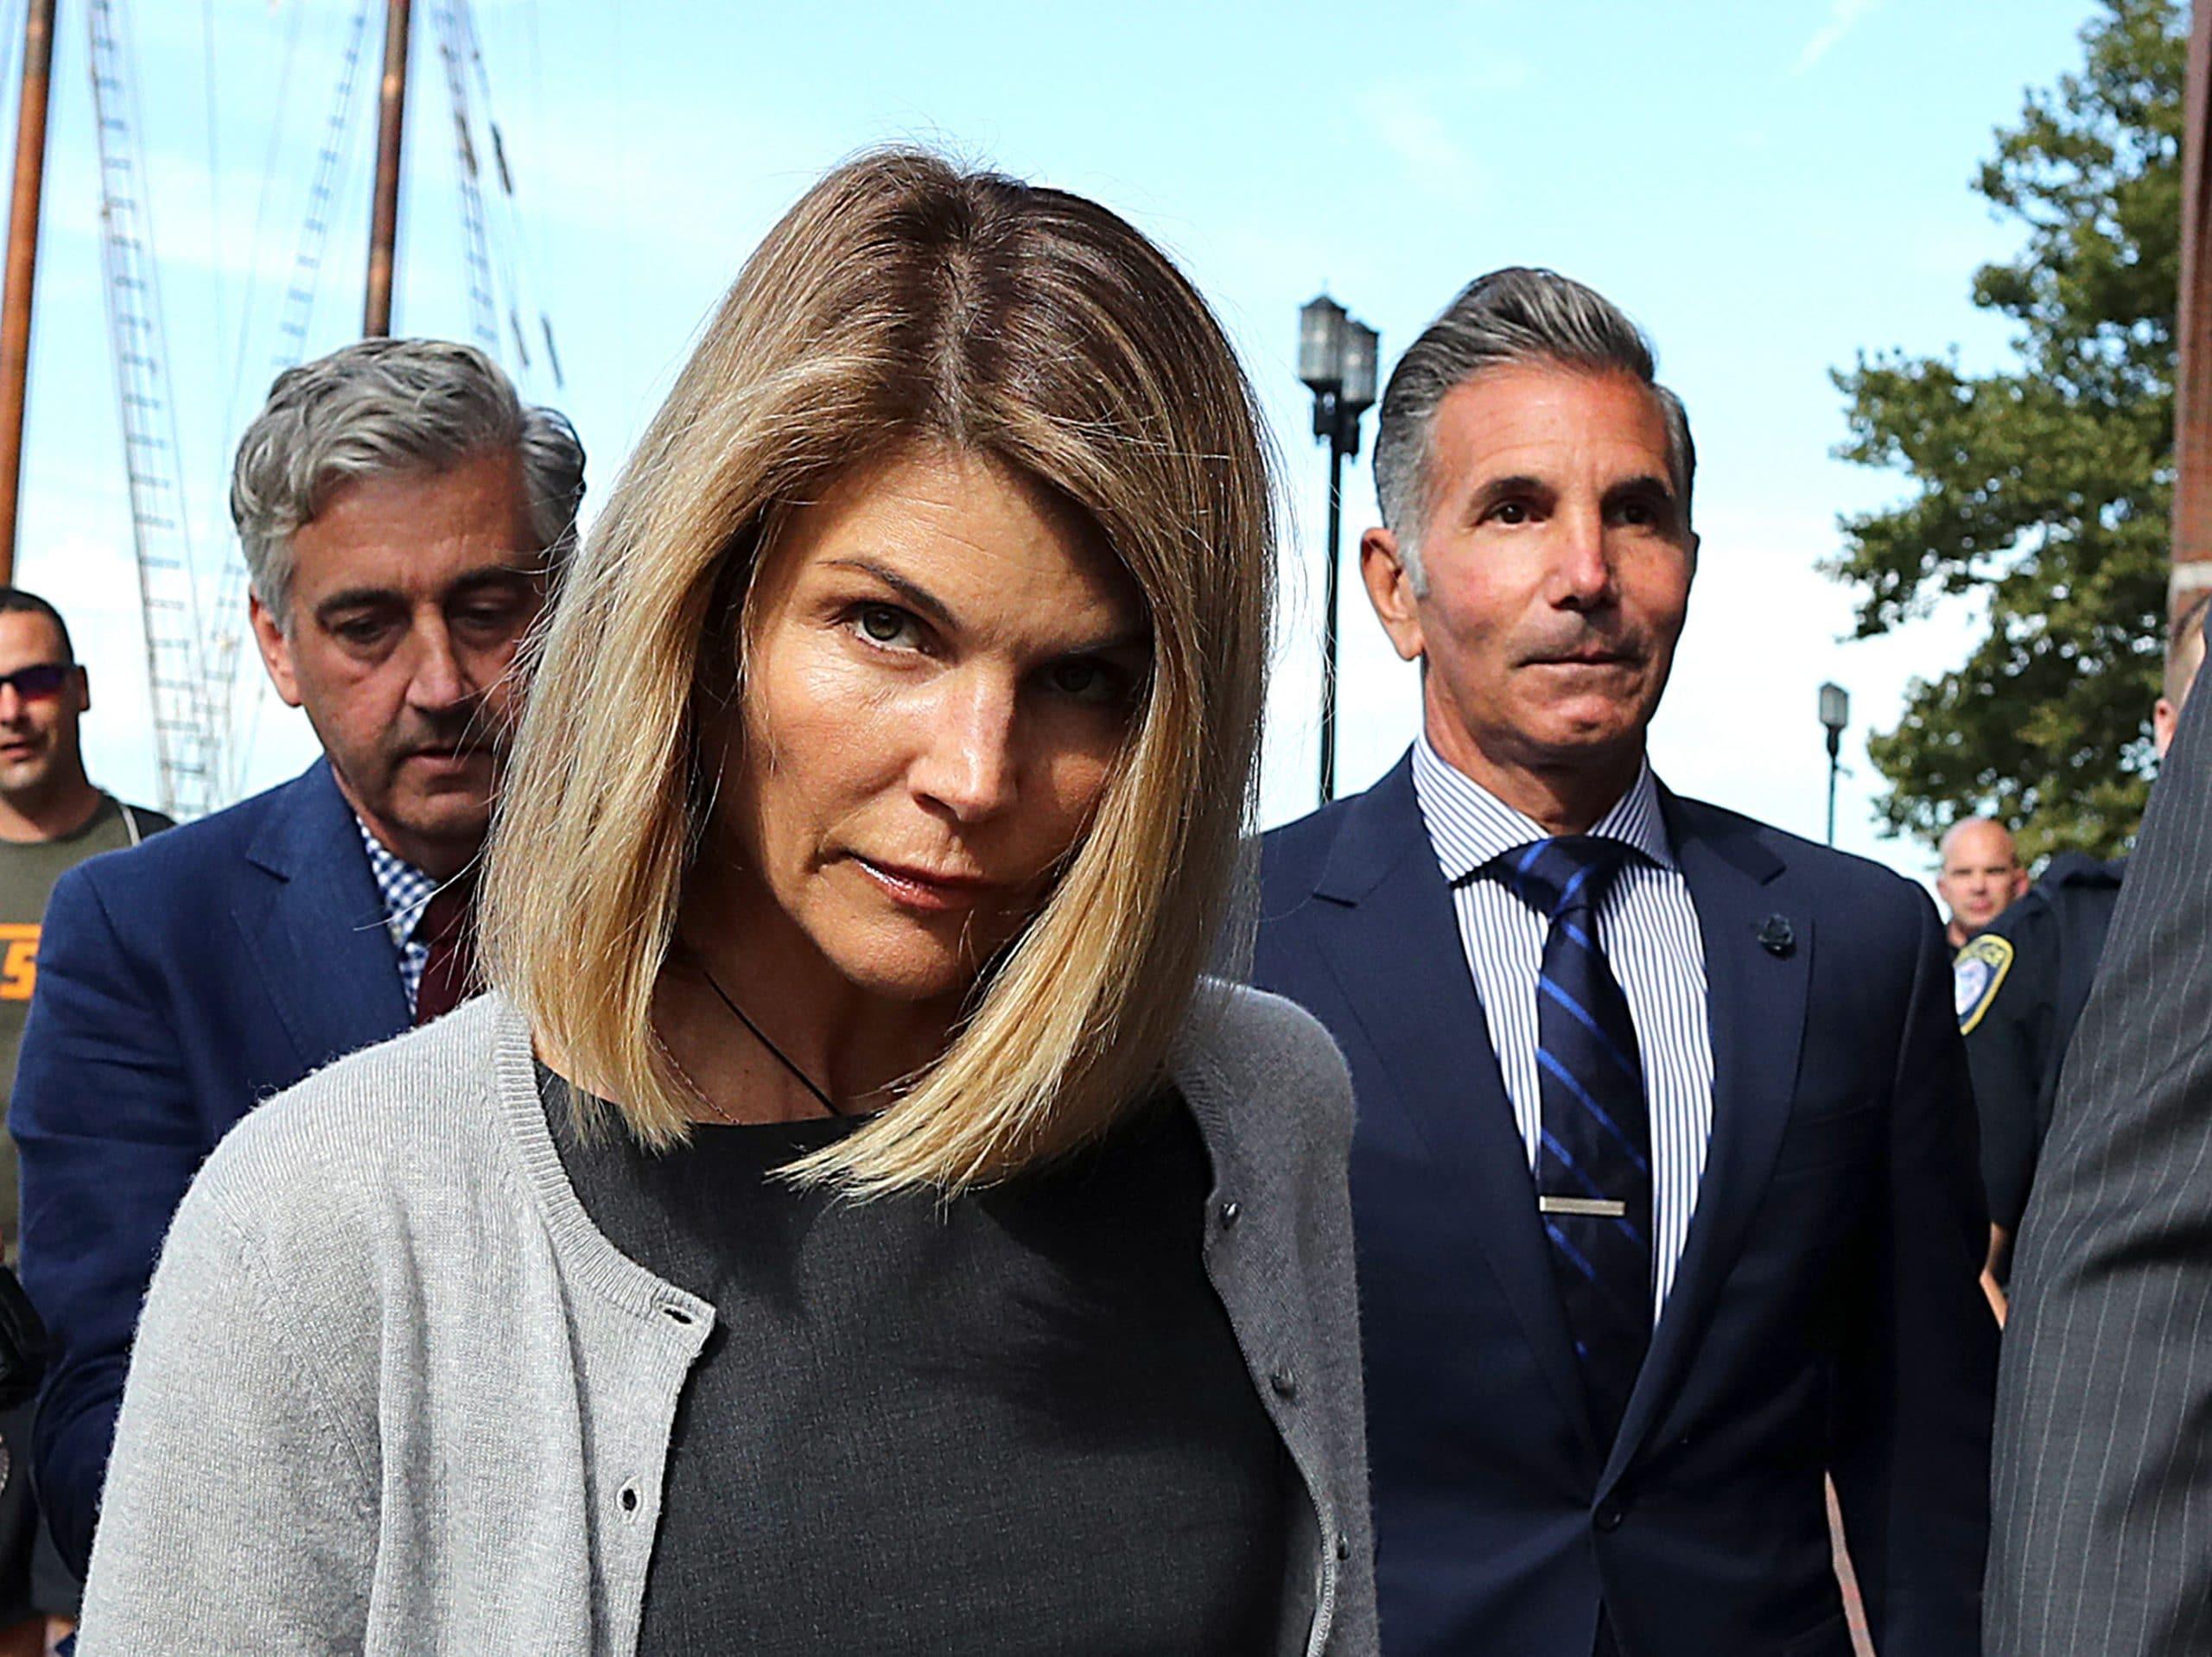 Lori Loughlin and her husband Mossimo Giannulli